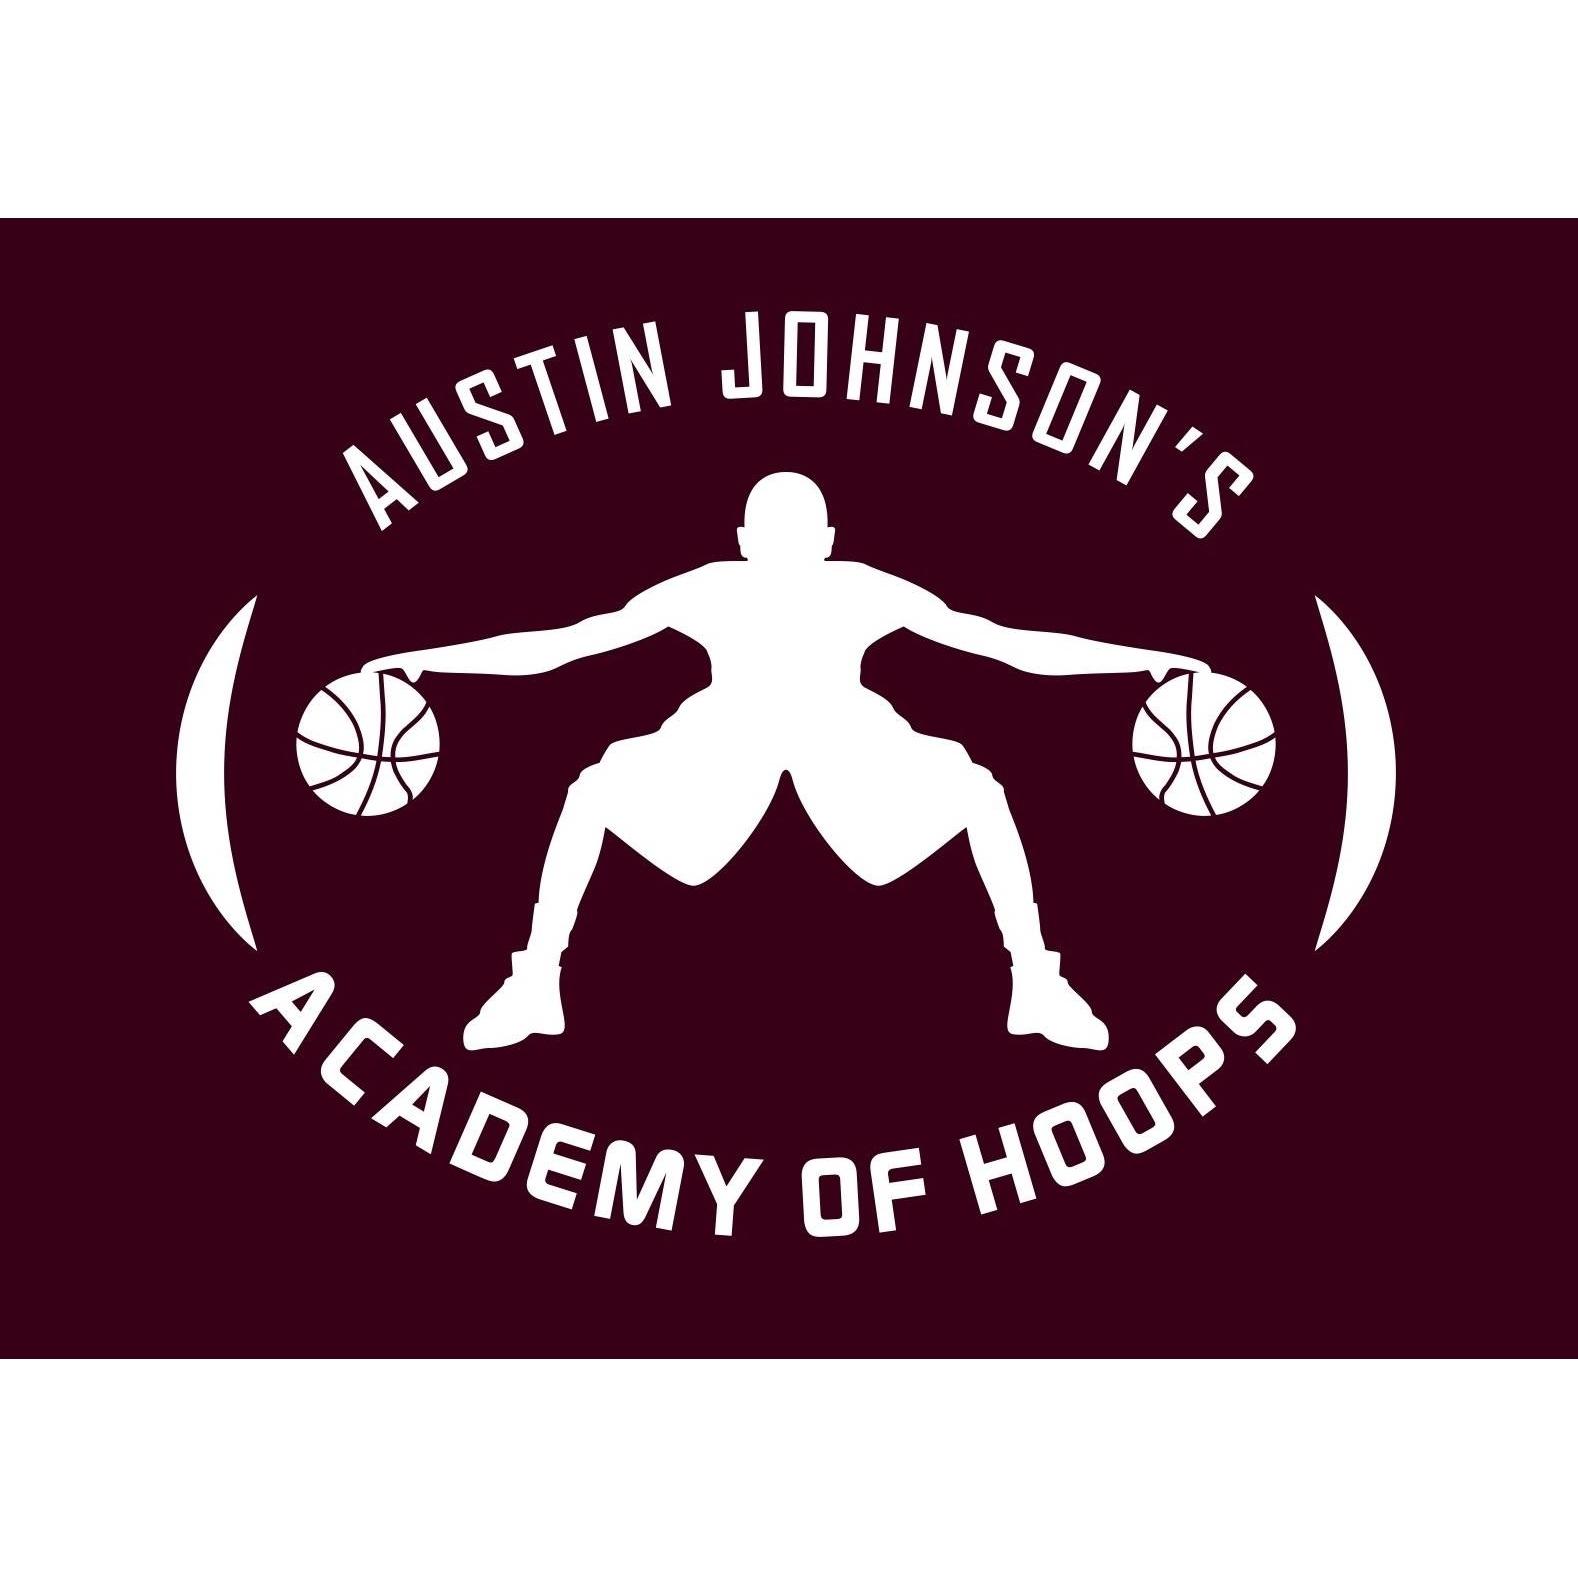 Austin Johnson's Academy of Hoops image 6